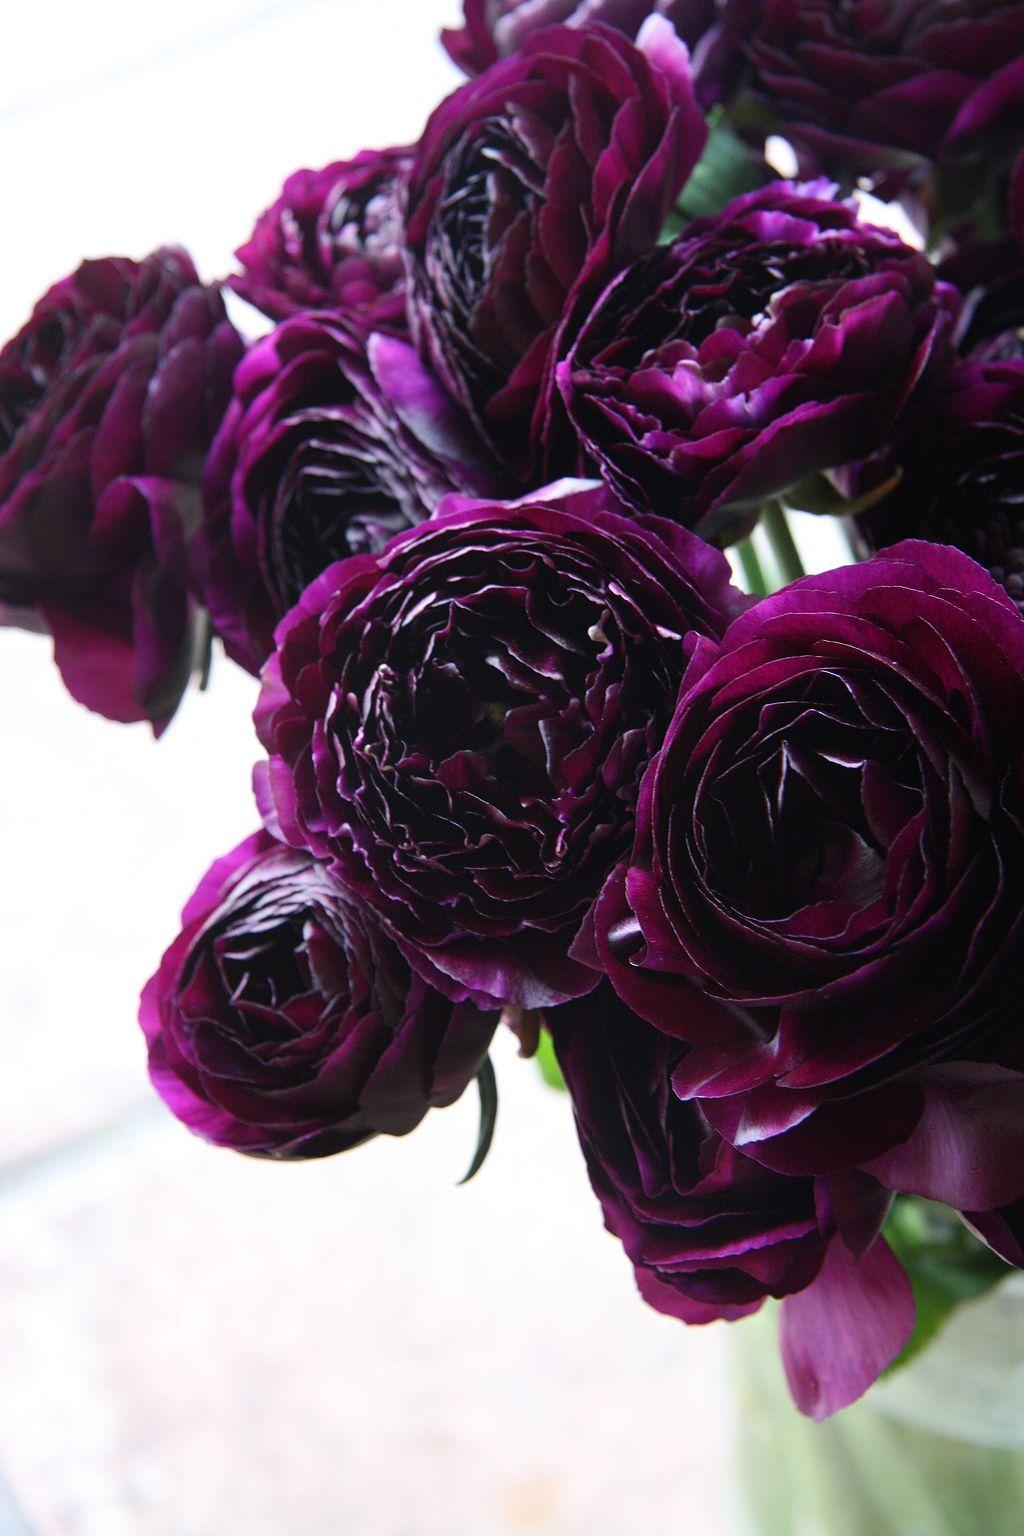 Cool Deep Purple Ranunculus Garden This Is My Favorit Shade Of Purple Https Gardenmagz Com Deep Purple Ranunculu Flowers Dark Purple Wedding Purple Flowers